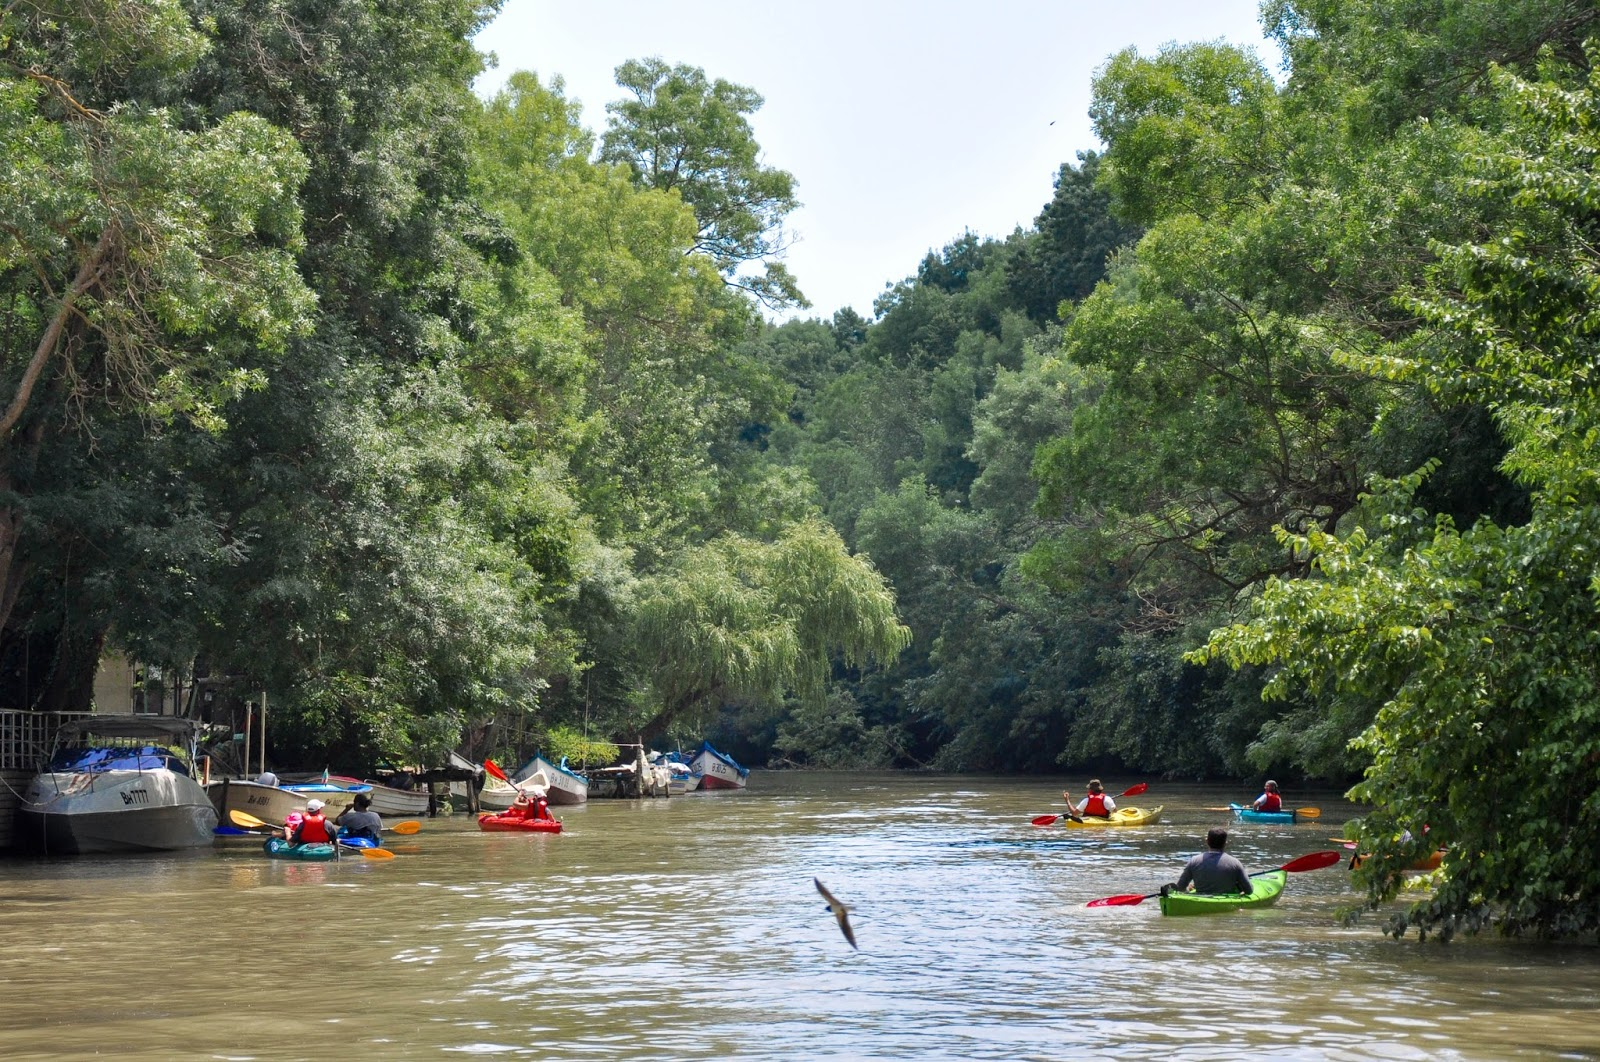 Canoeing down Kamchia river, Bulgaria